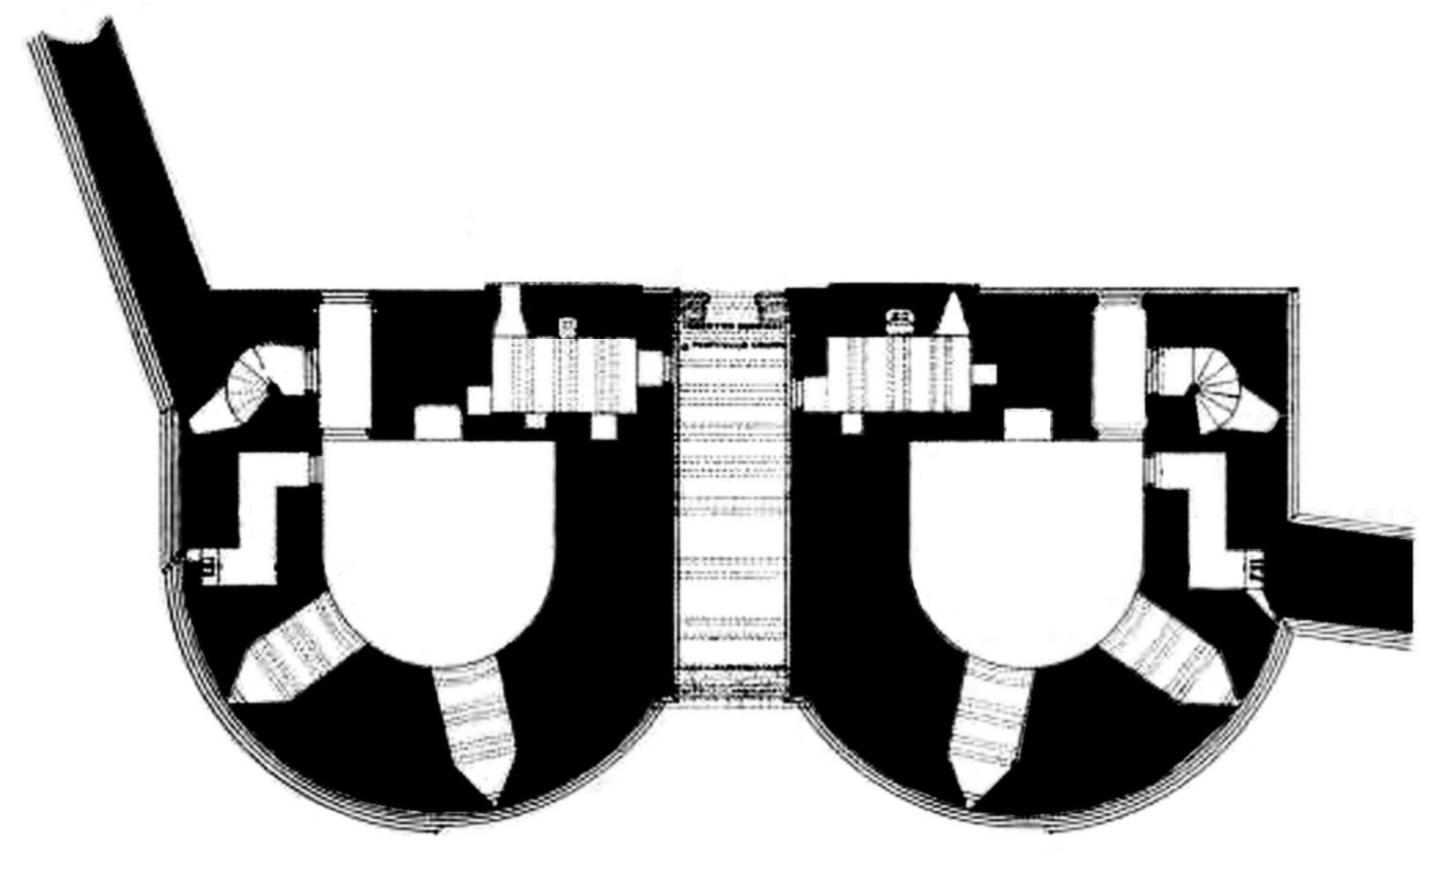 File:Plan of Dunstanburgh Castle gatehouse.jpg - Wikimedia Commons